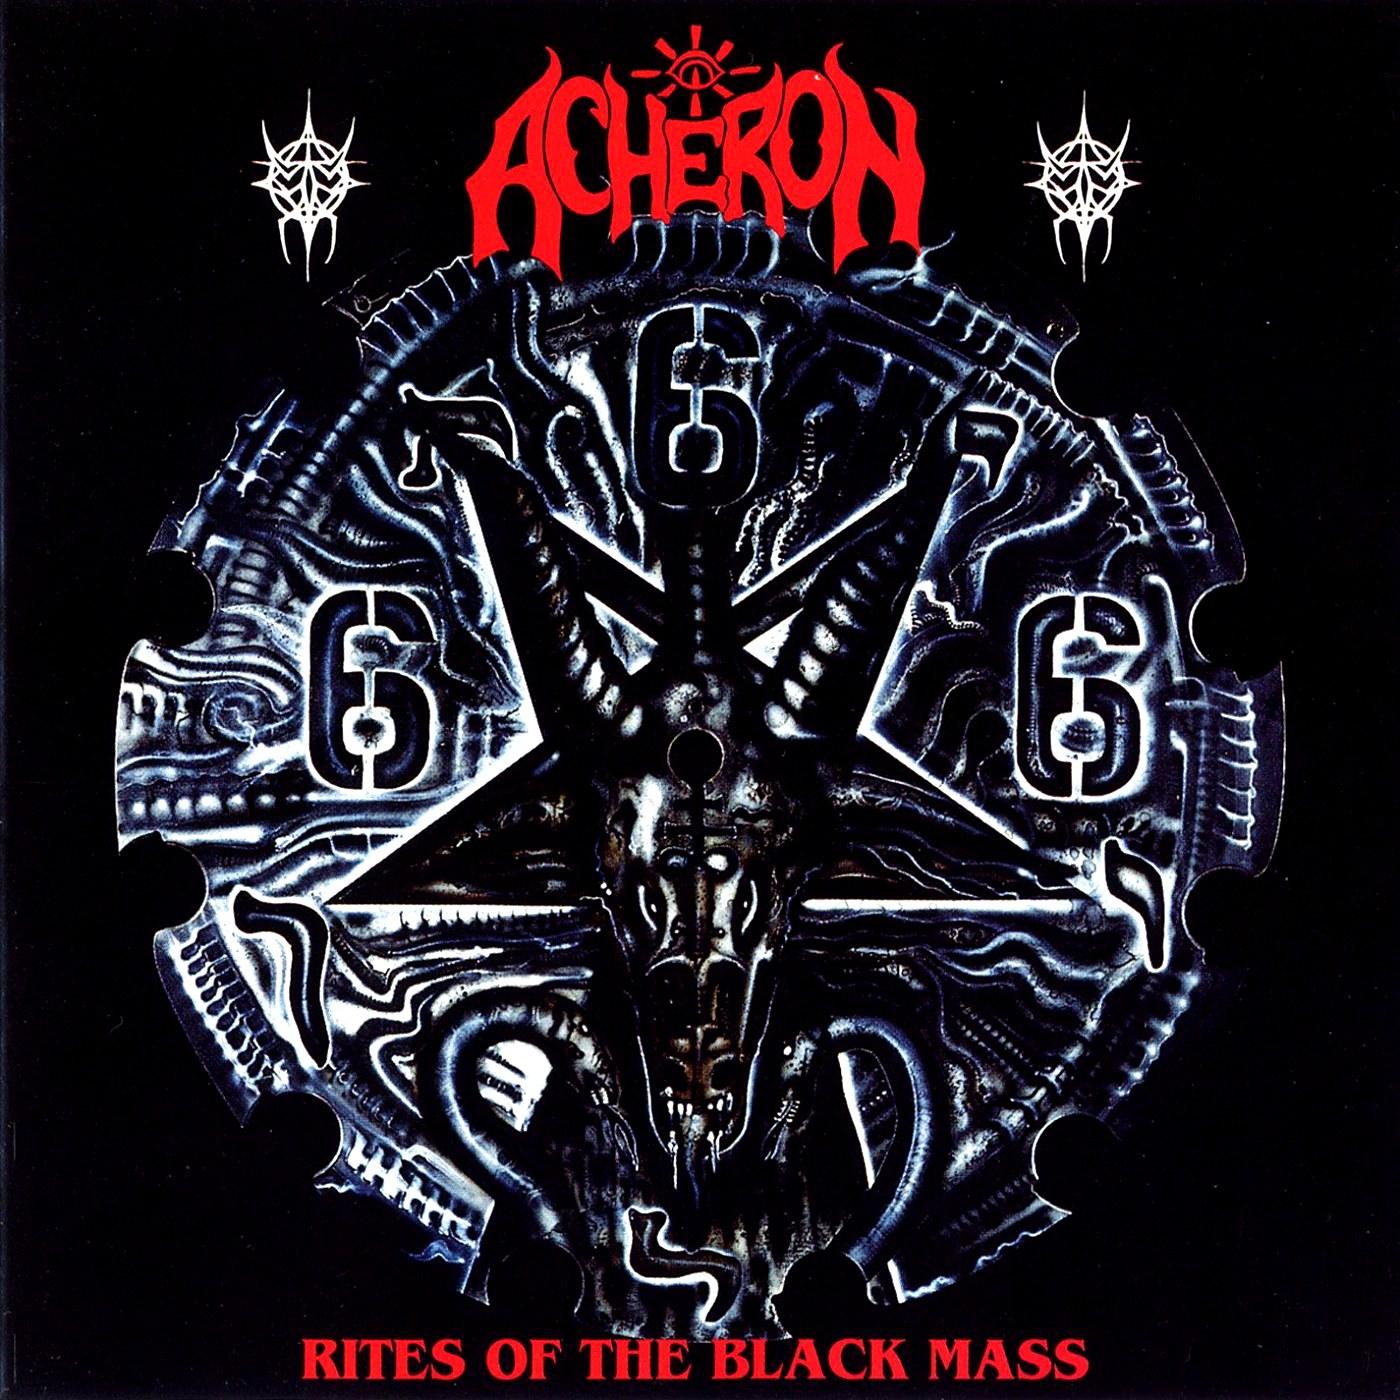 Reviews for Acheron - Rites of the Black Mass